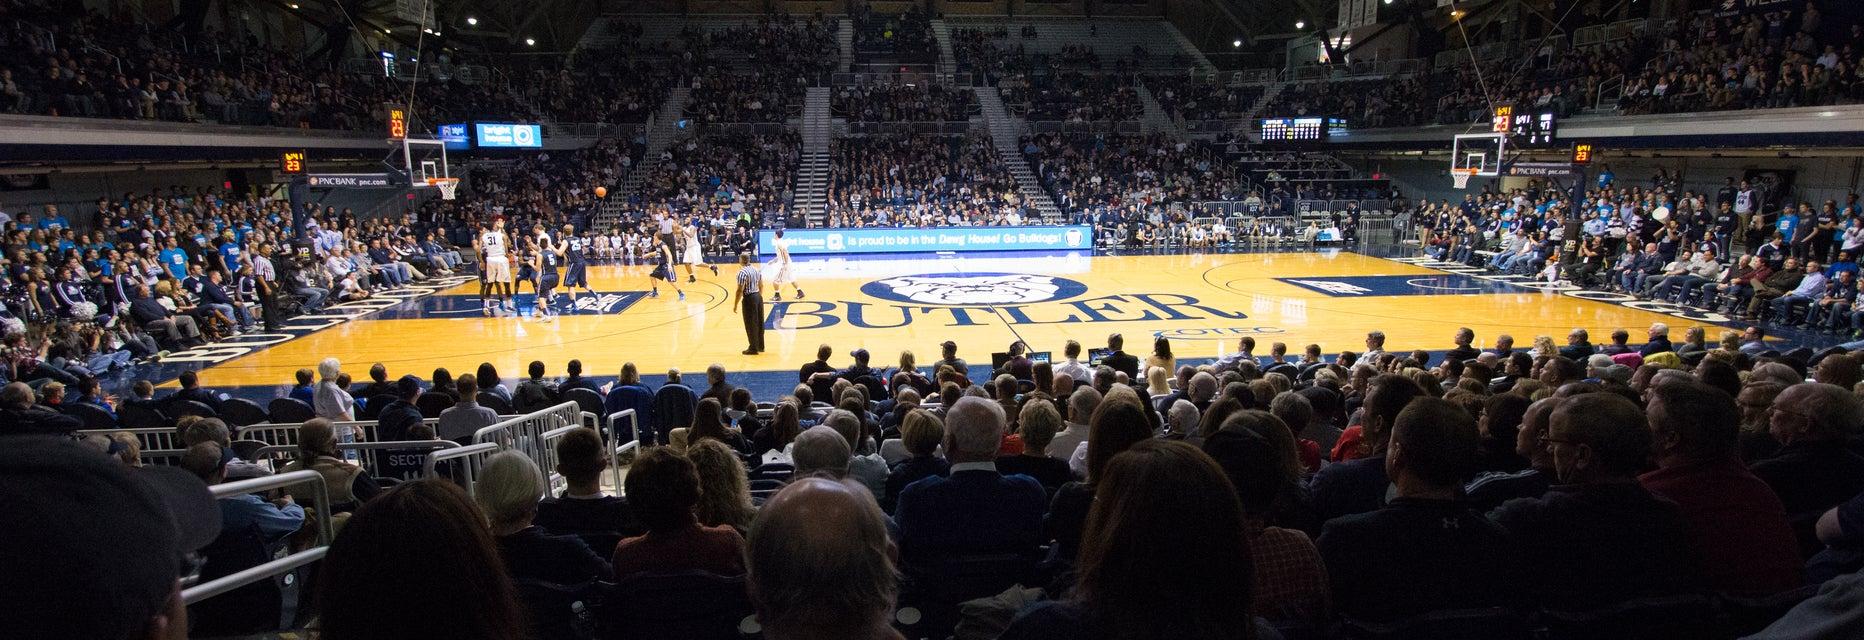 Butler Basketball Tickets